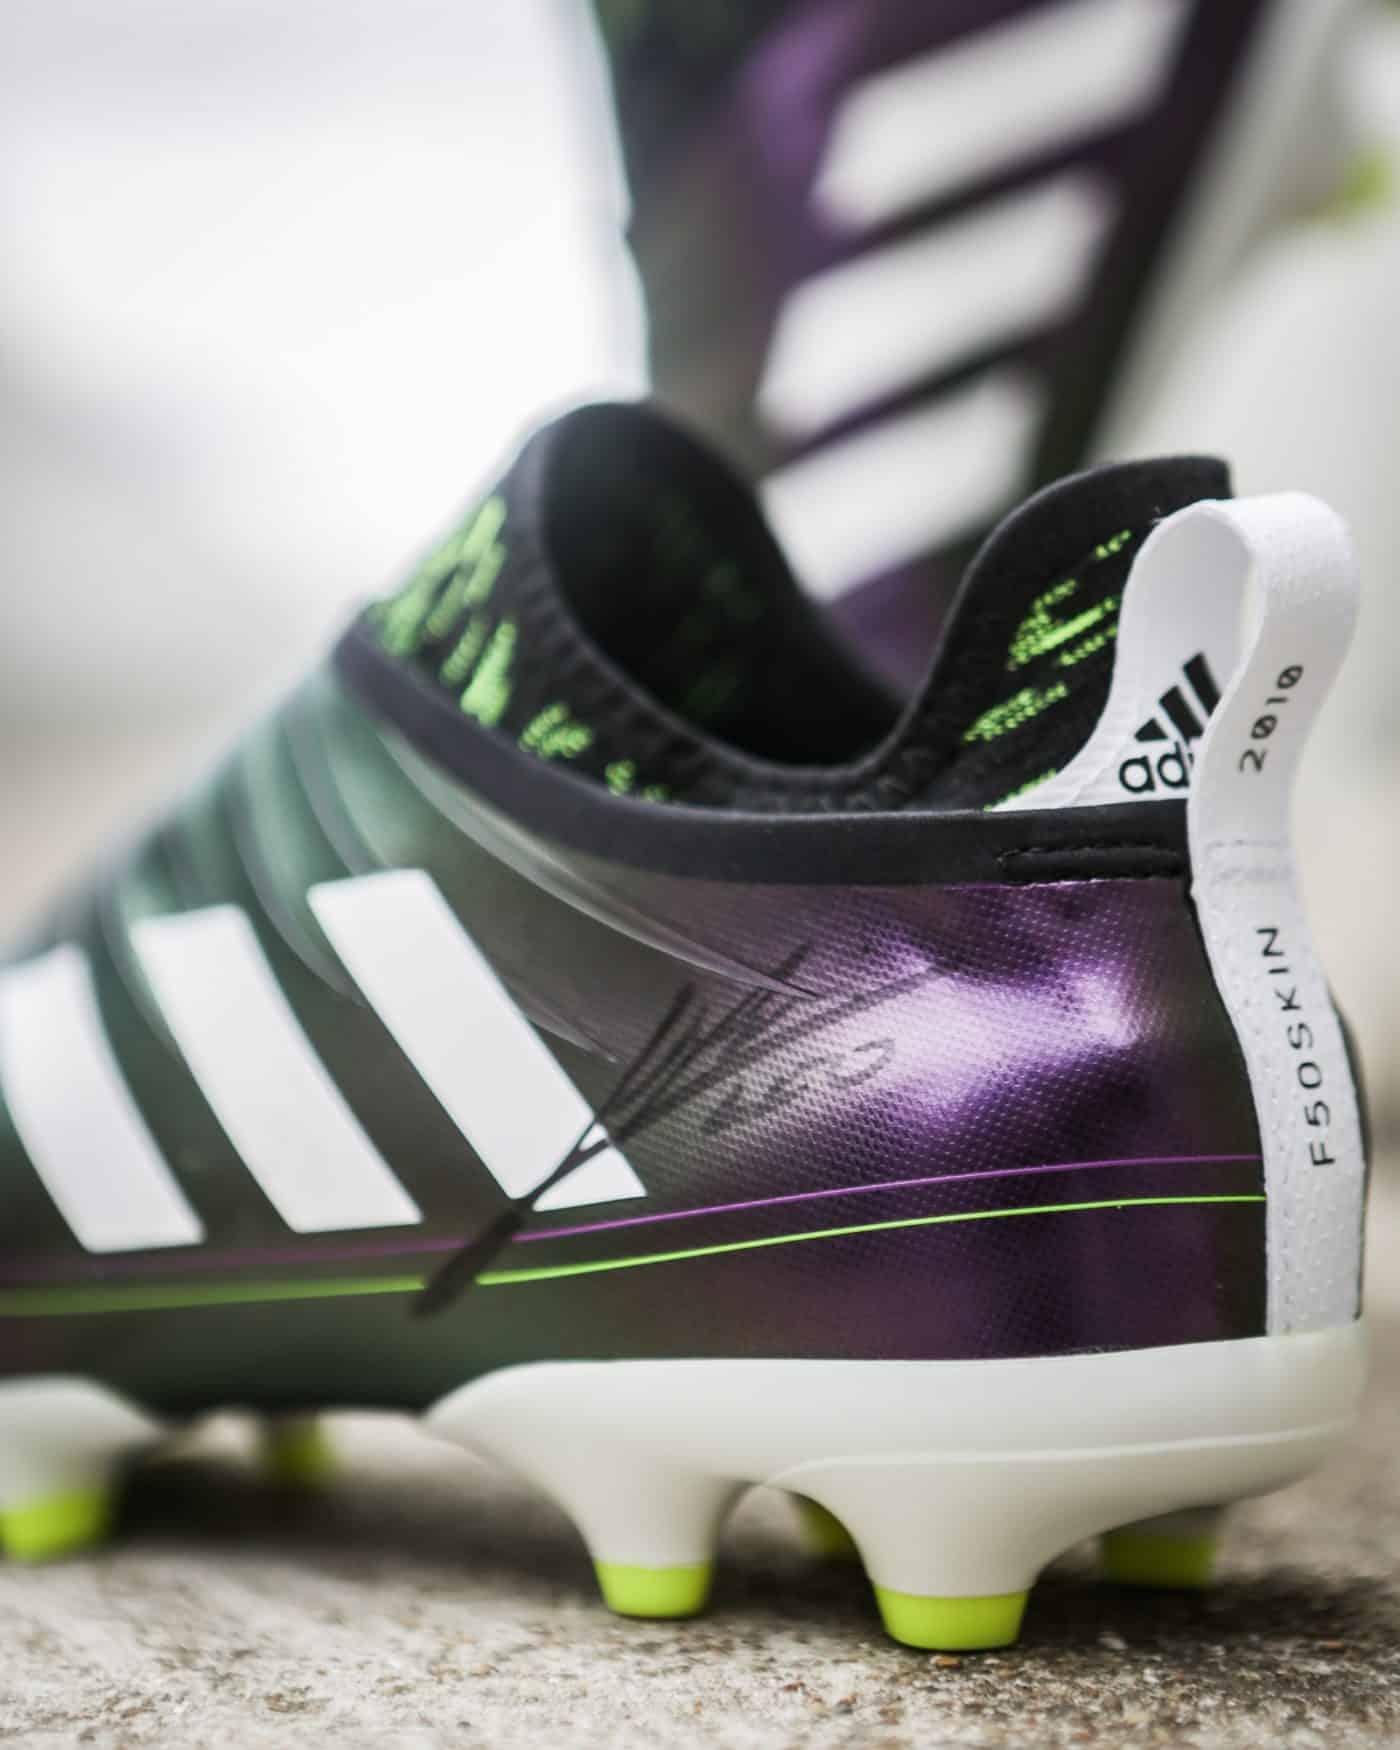 adidas-glitch-skin-F50-lionel-messi-footpack-2